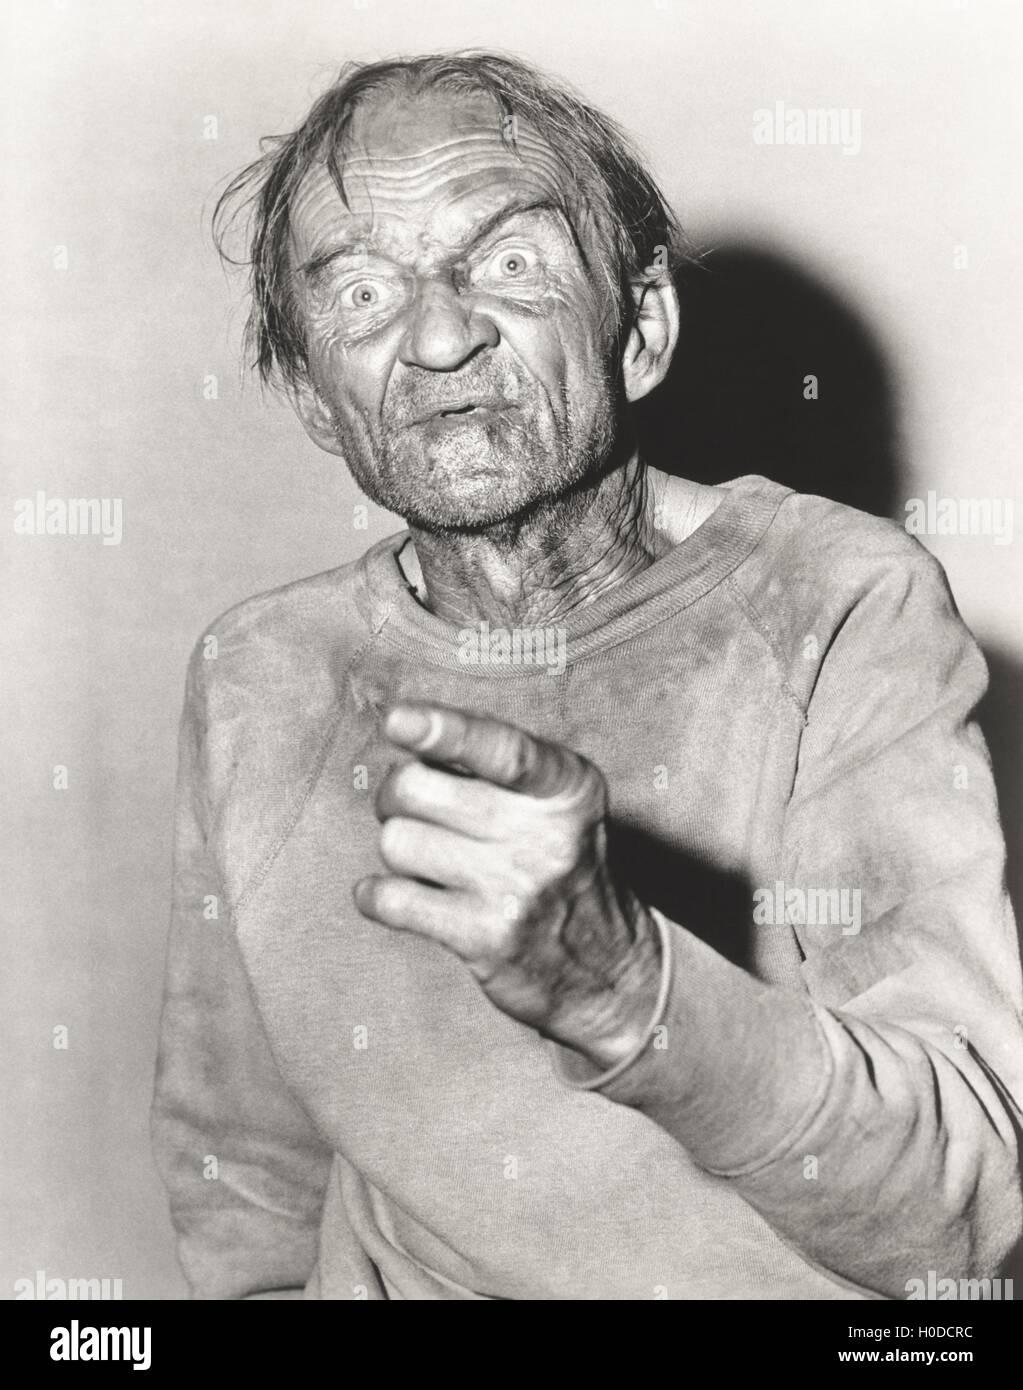 Elderly man pointing a finger - Stock Image